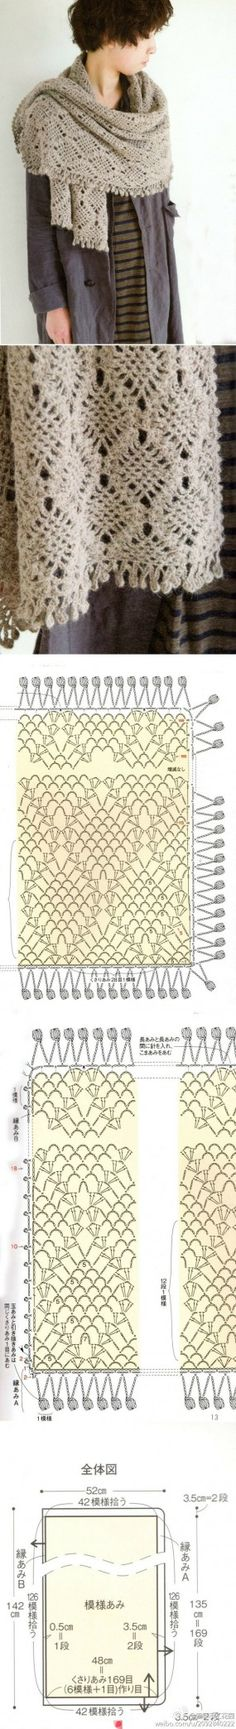 Free scarf pattern - nice fall crochet!